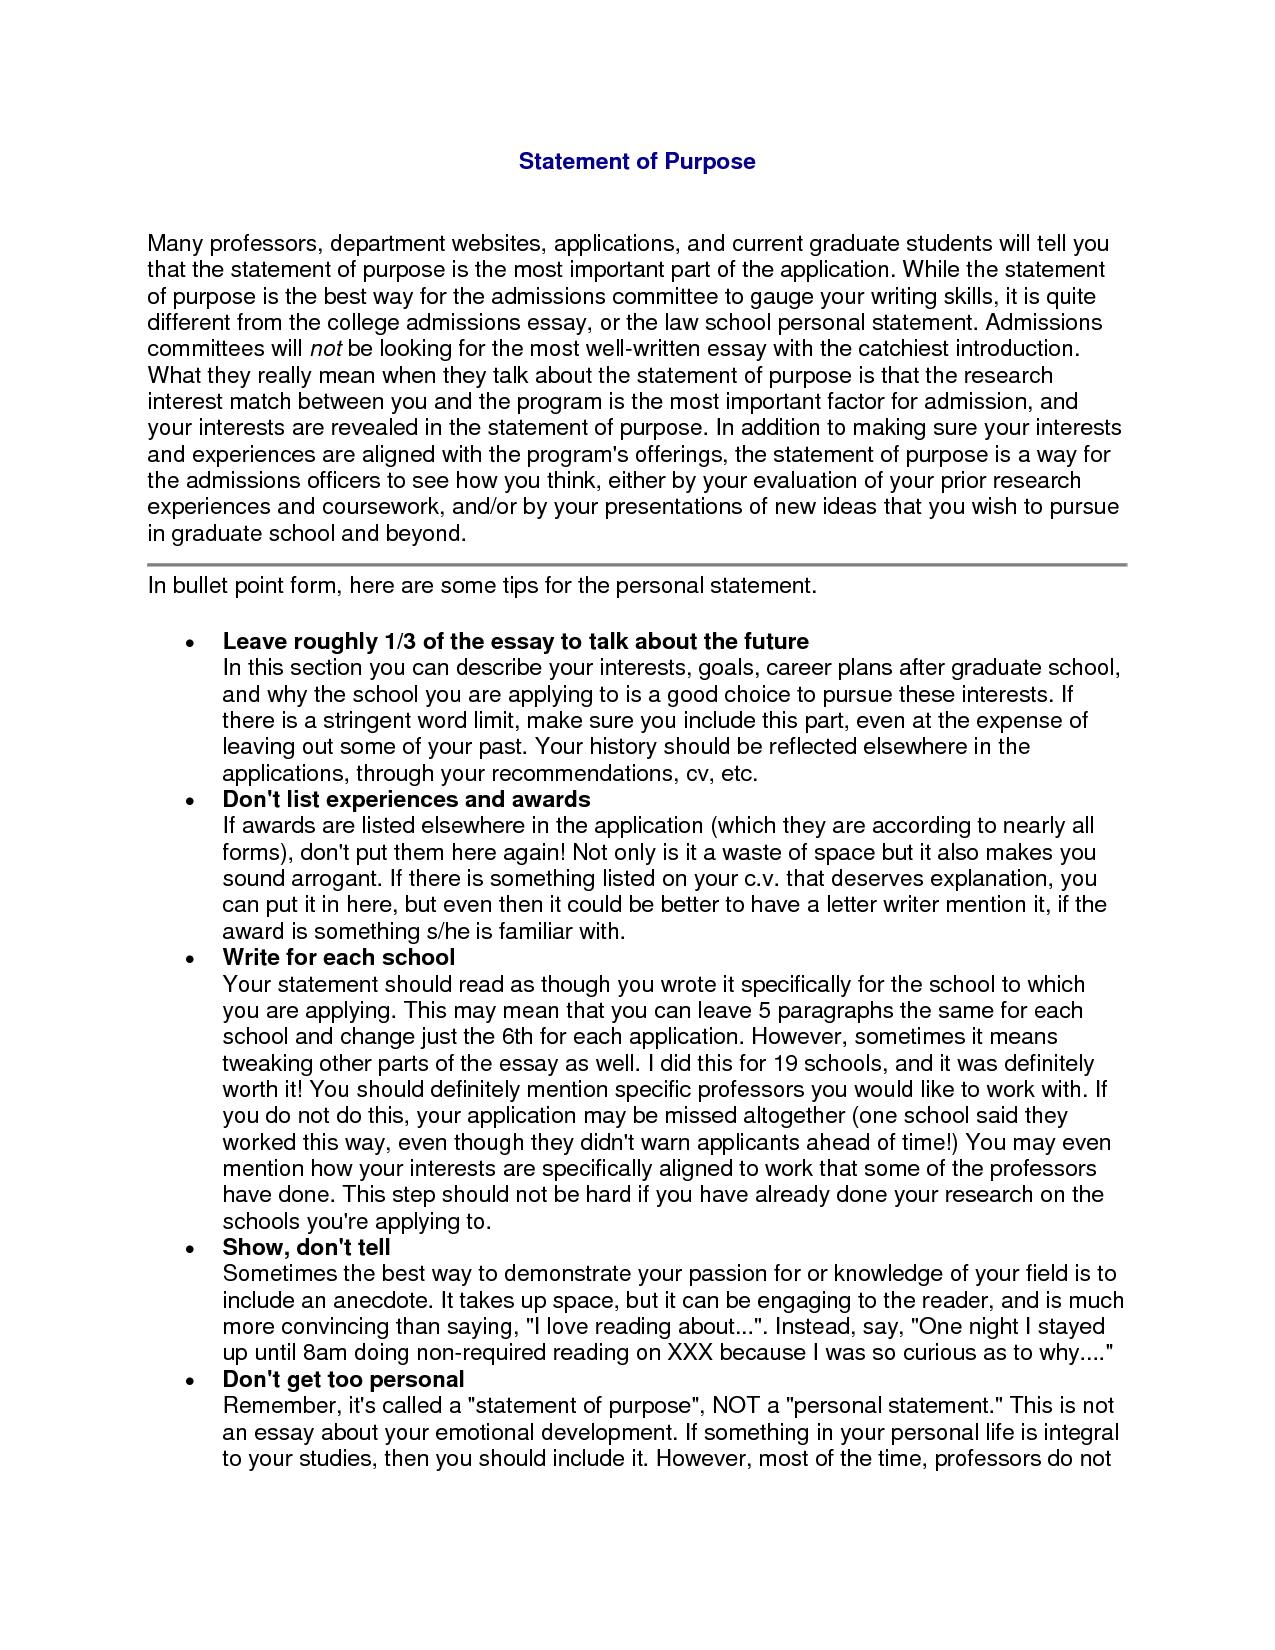 Purdue application essay help